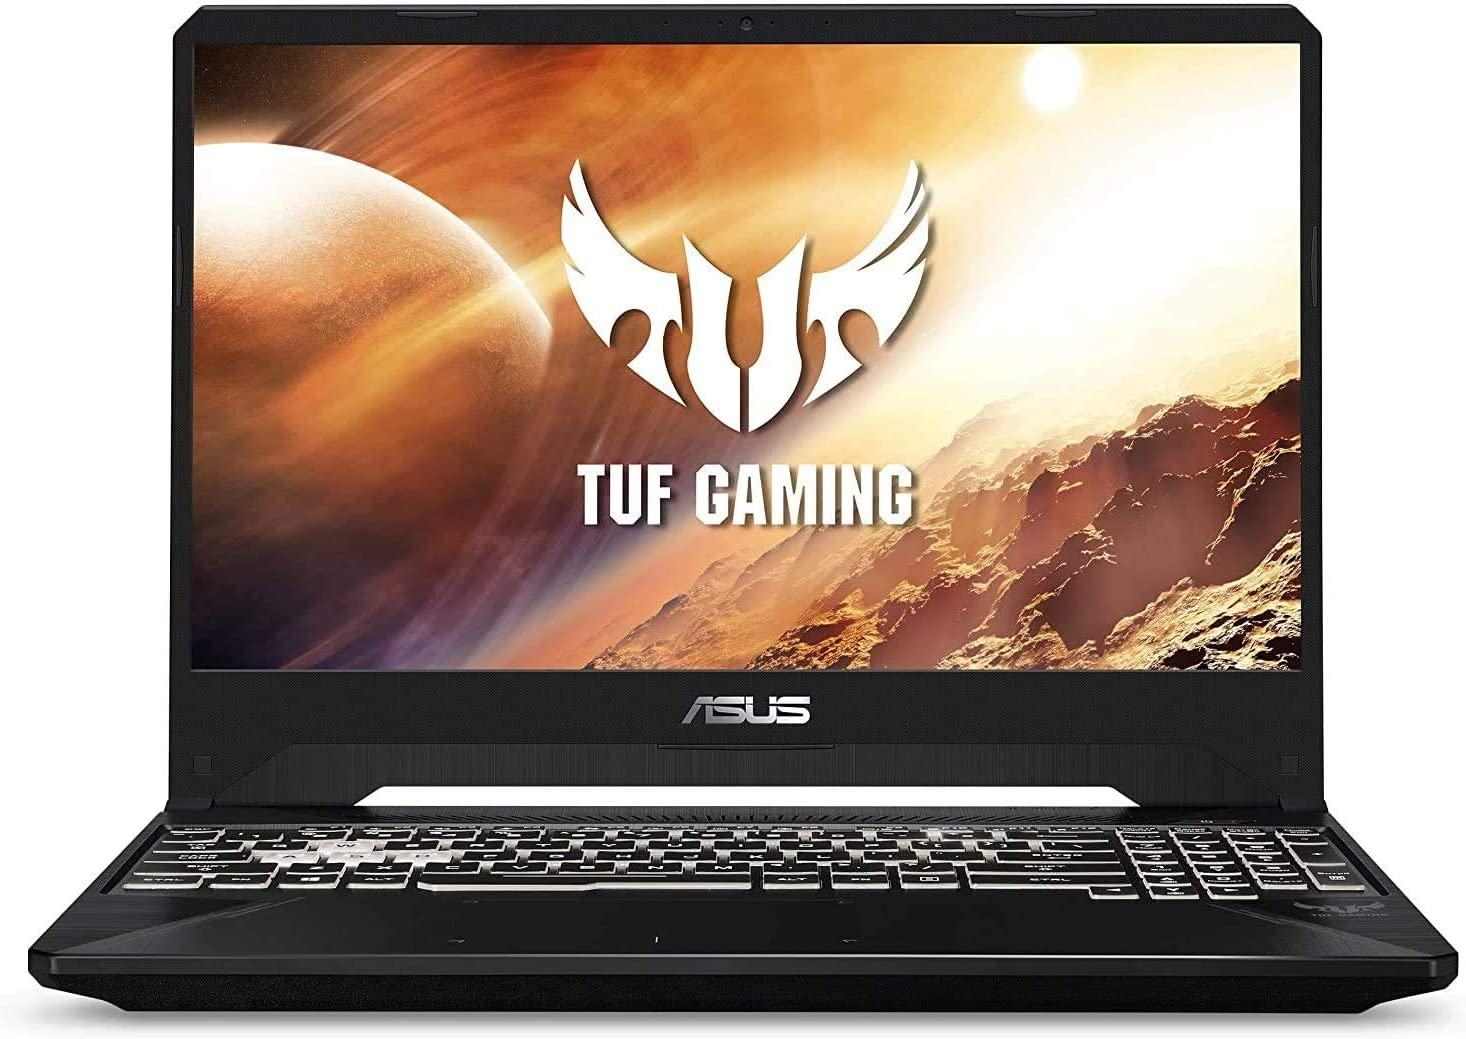 8 Best Gaming Laptops under $700 in 2021 [Top Budget Models]